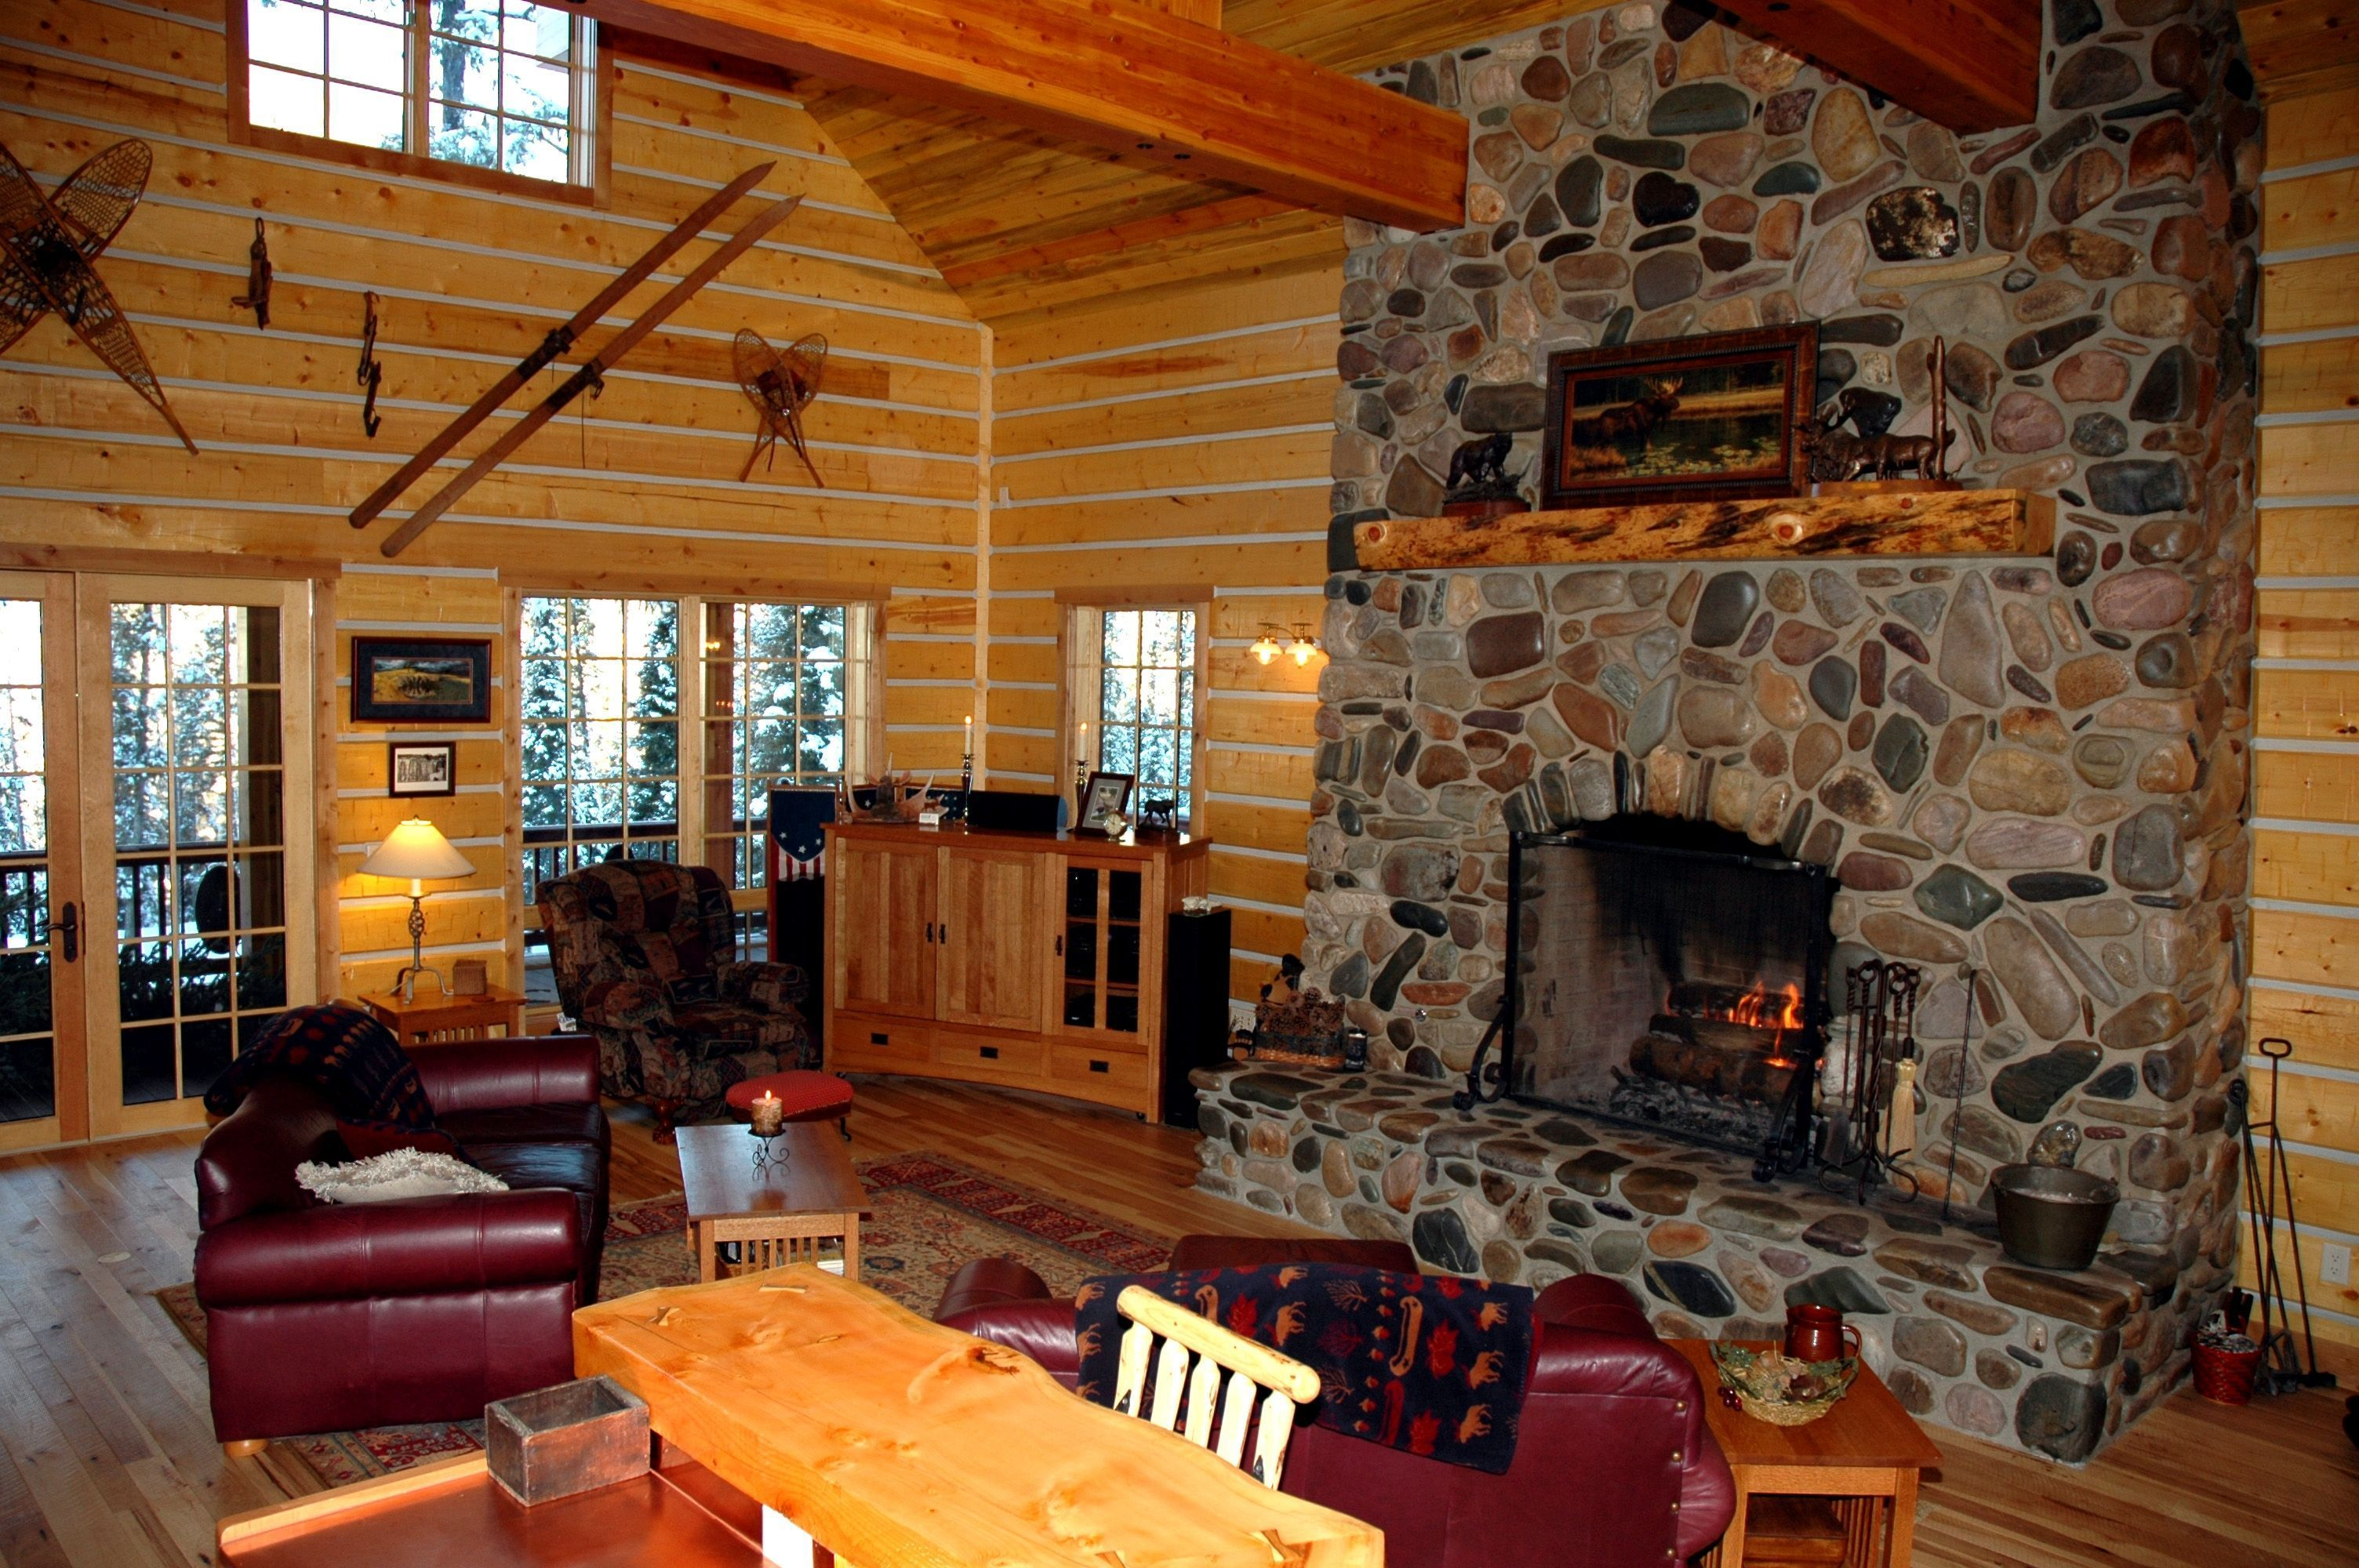 Log Cabin Fireplace Ideas - Log Home Interior Decorating ...